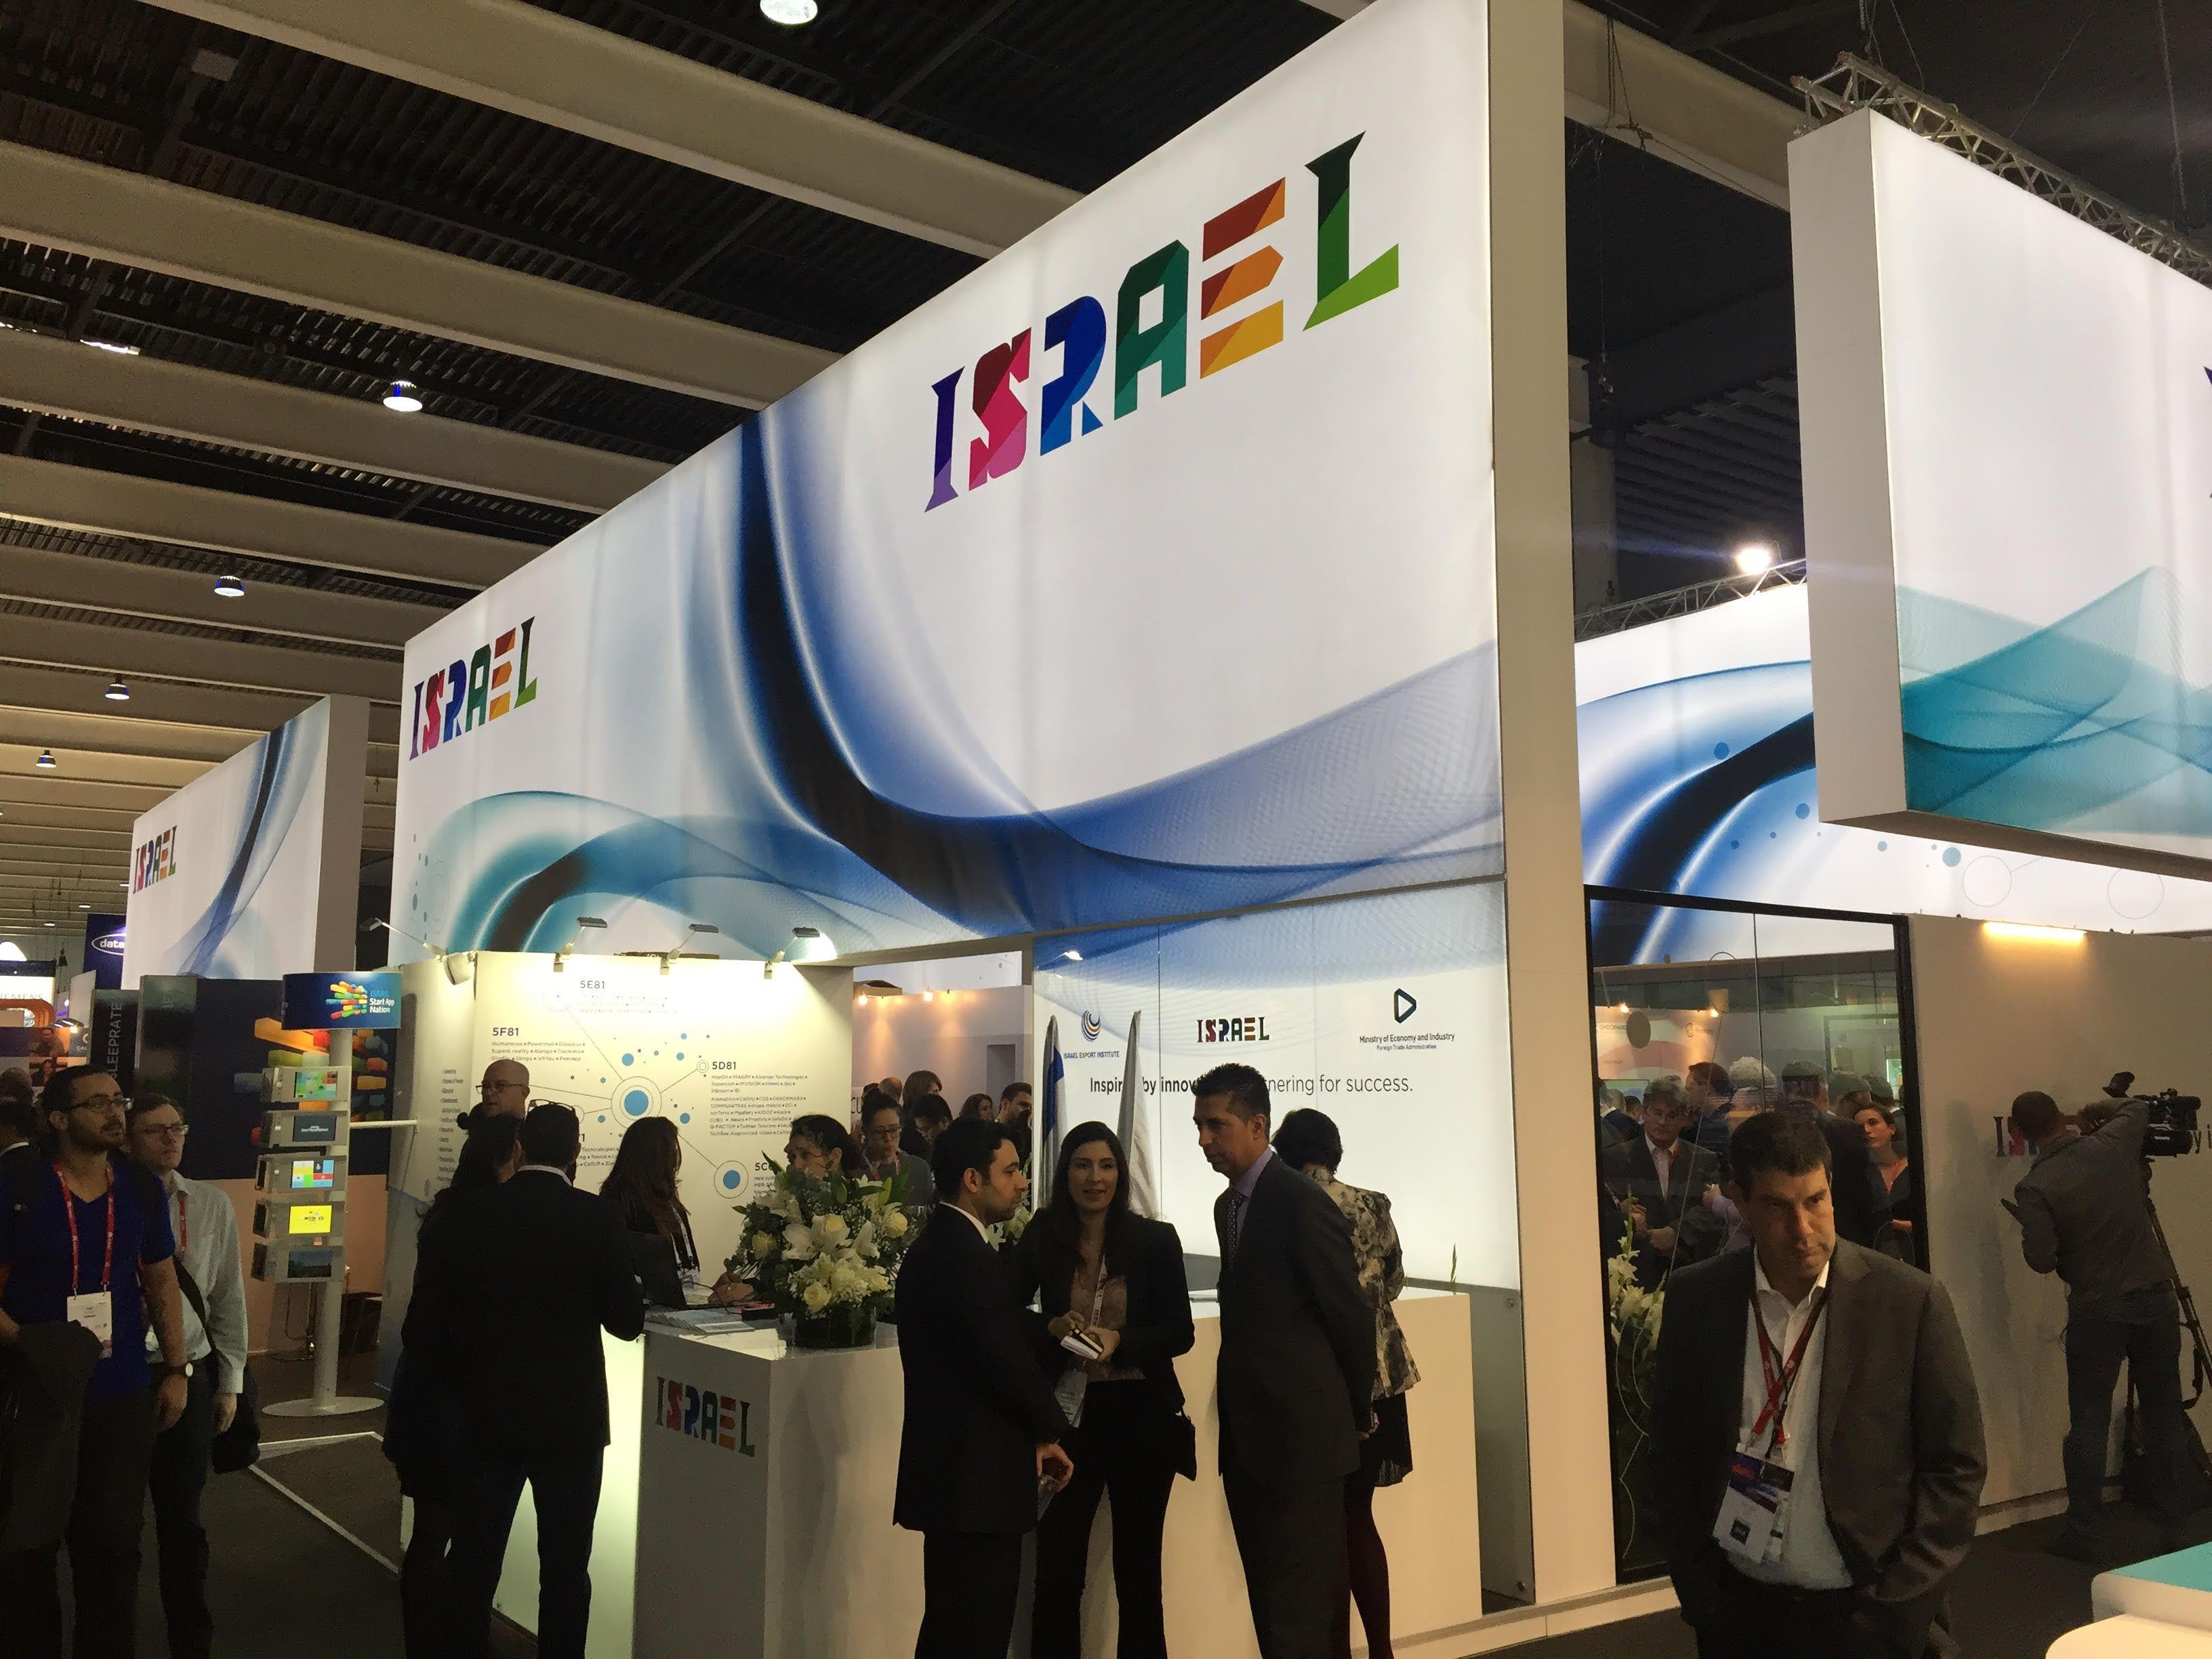 Israël, star mondiale de la high-tech à Barcelone